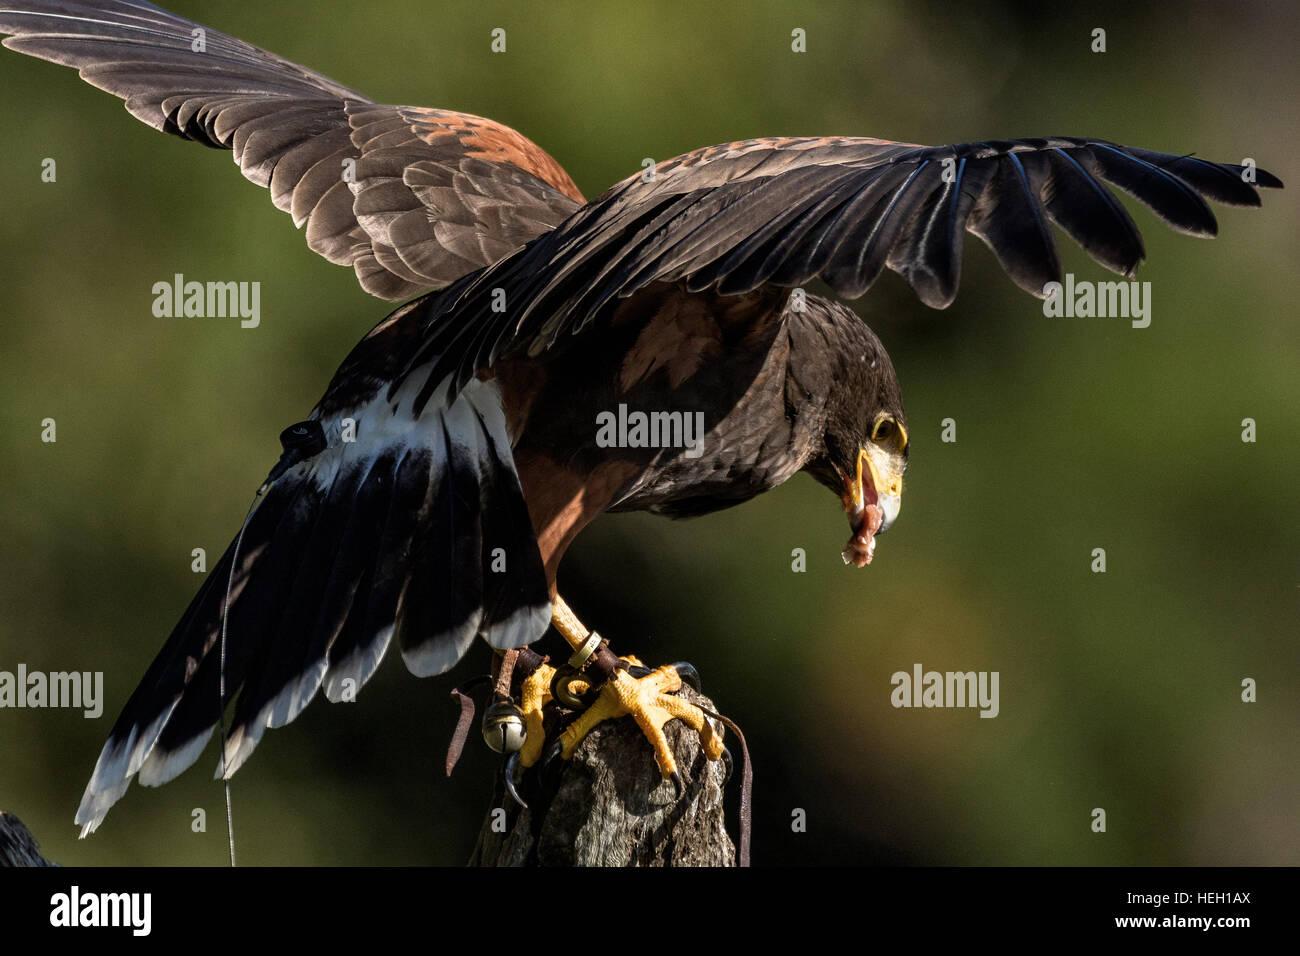 Red tailed hawk landing